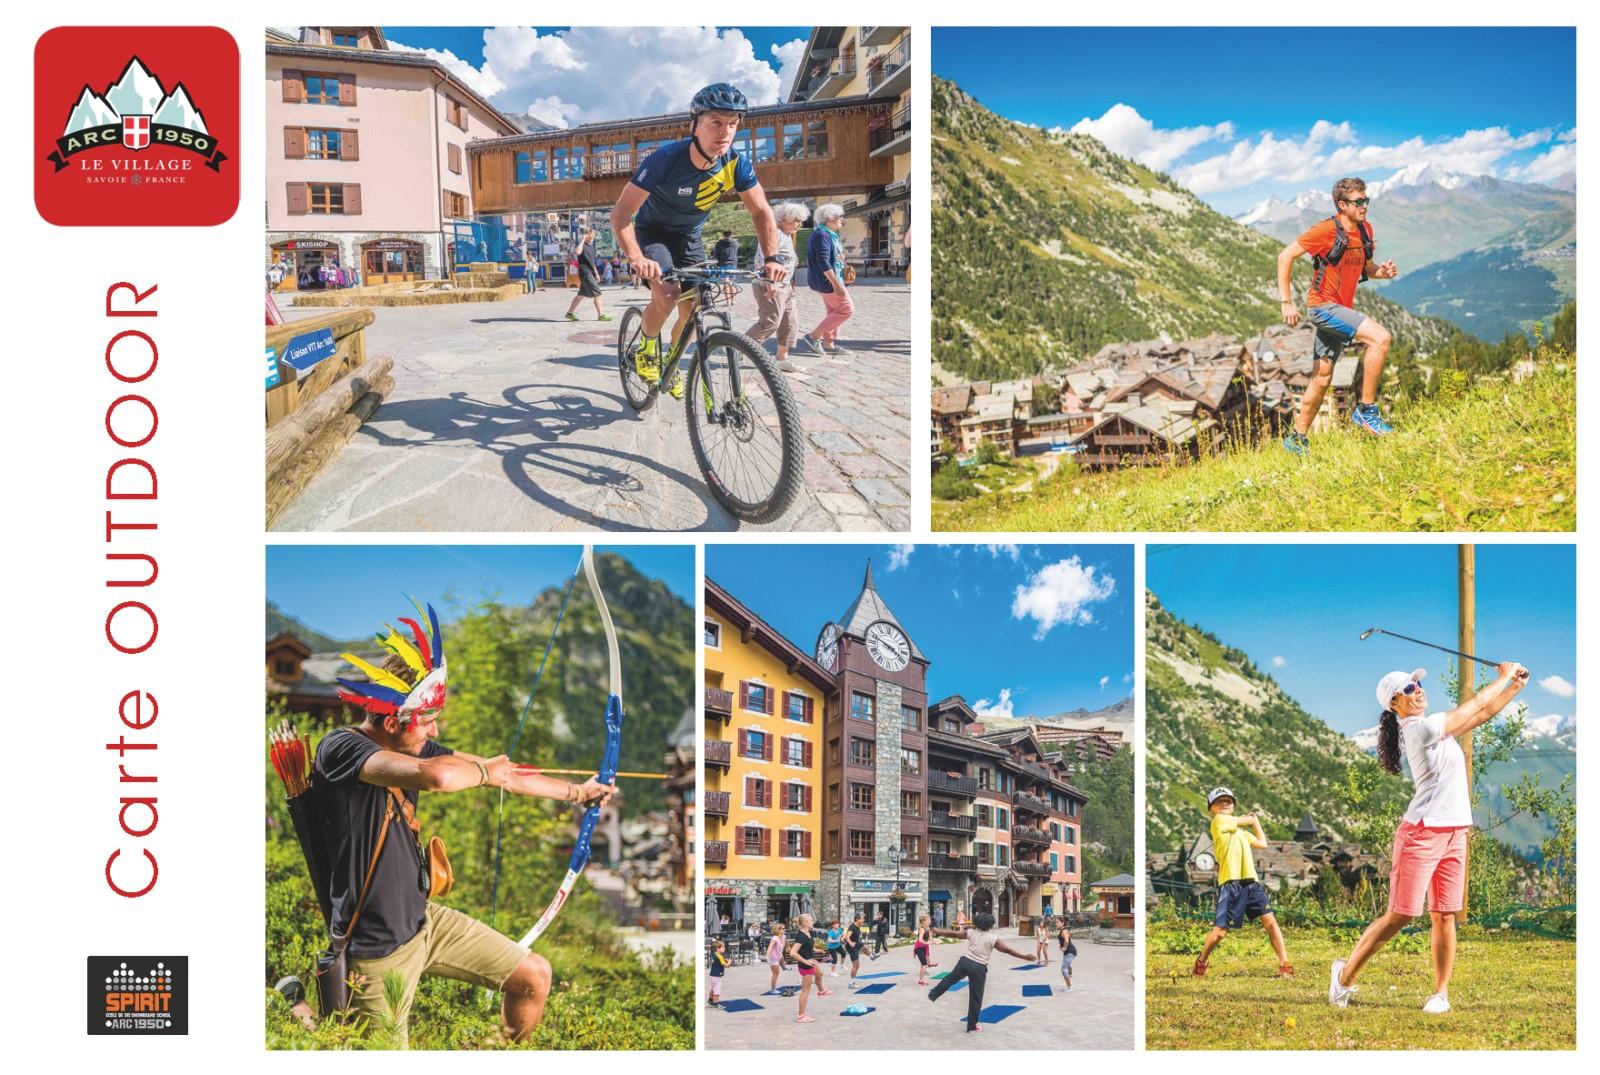 Free outdoor activities mountain luxury stay arc 1950 les arcs